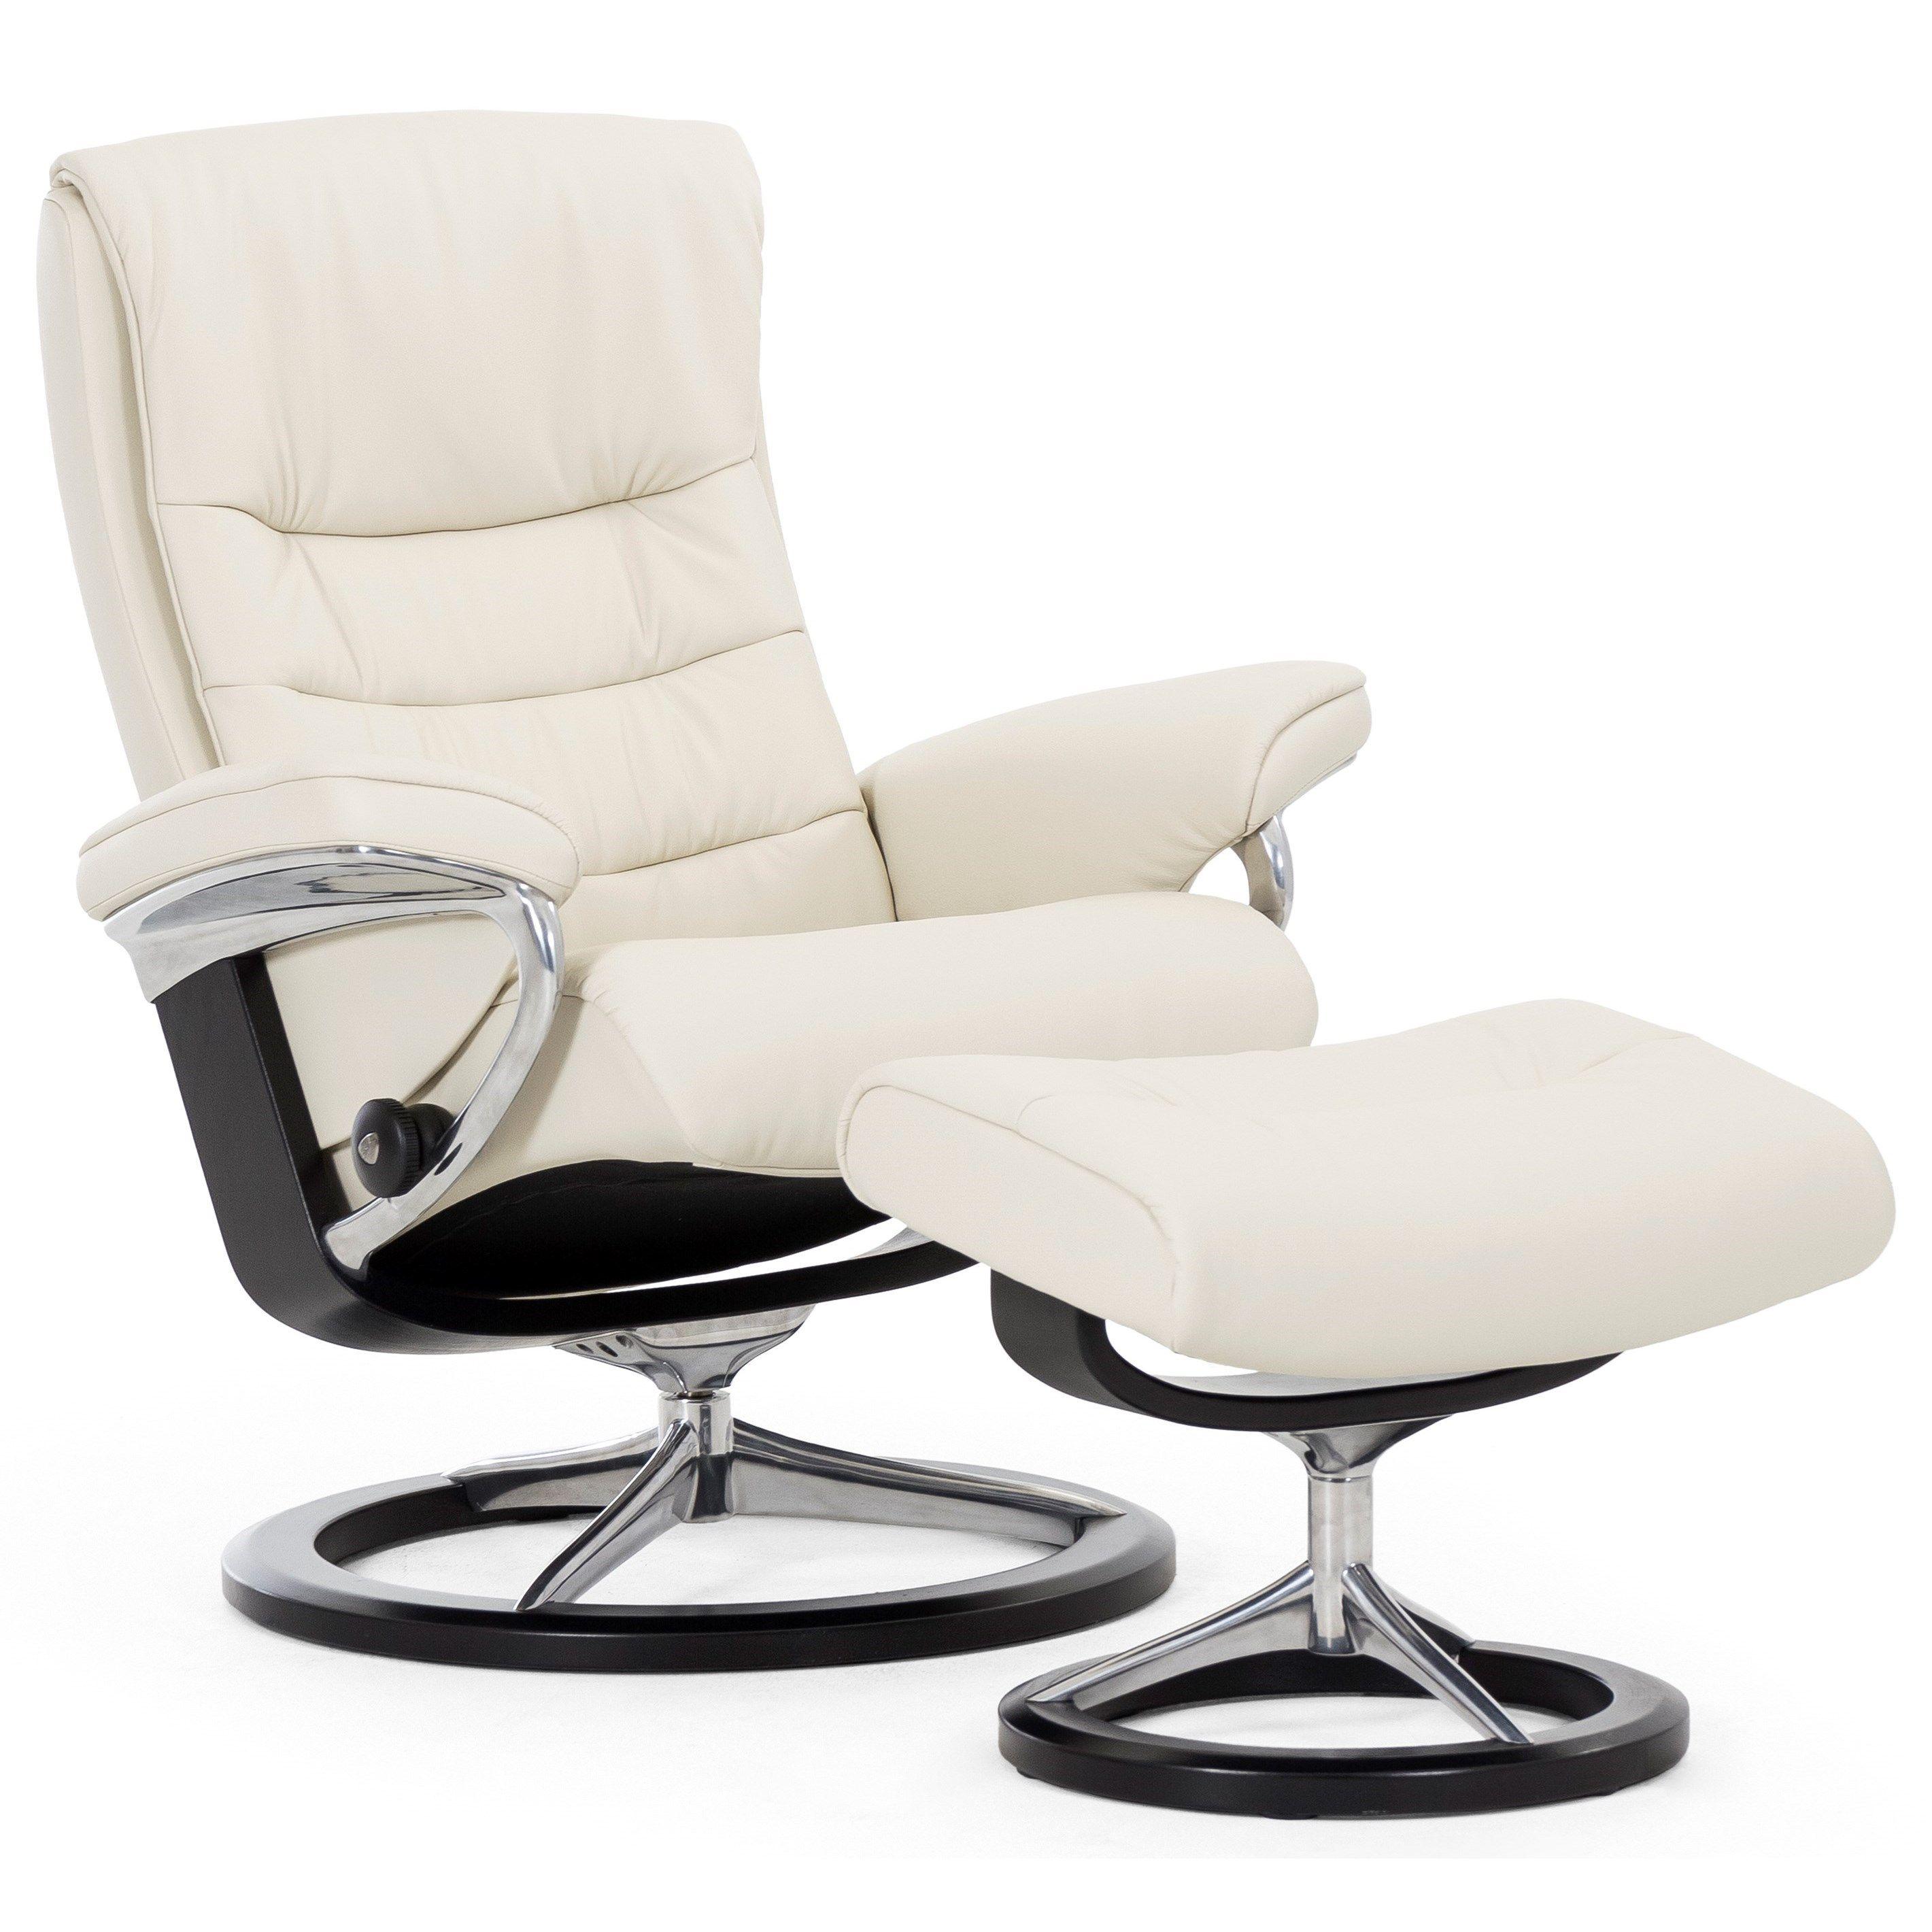 ekornes recliner chairs get home inteiror house design inspiration